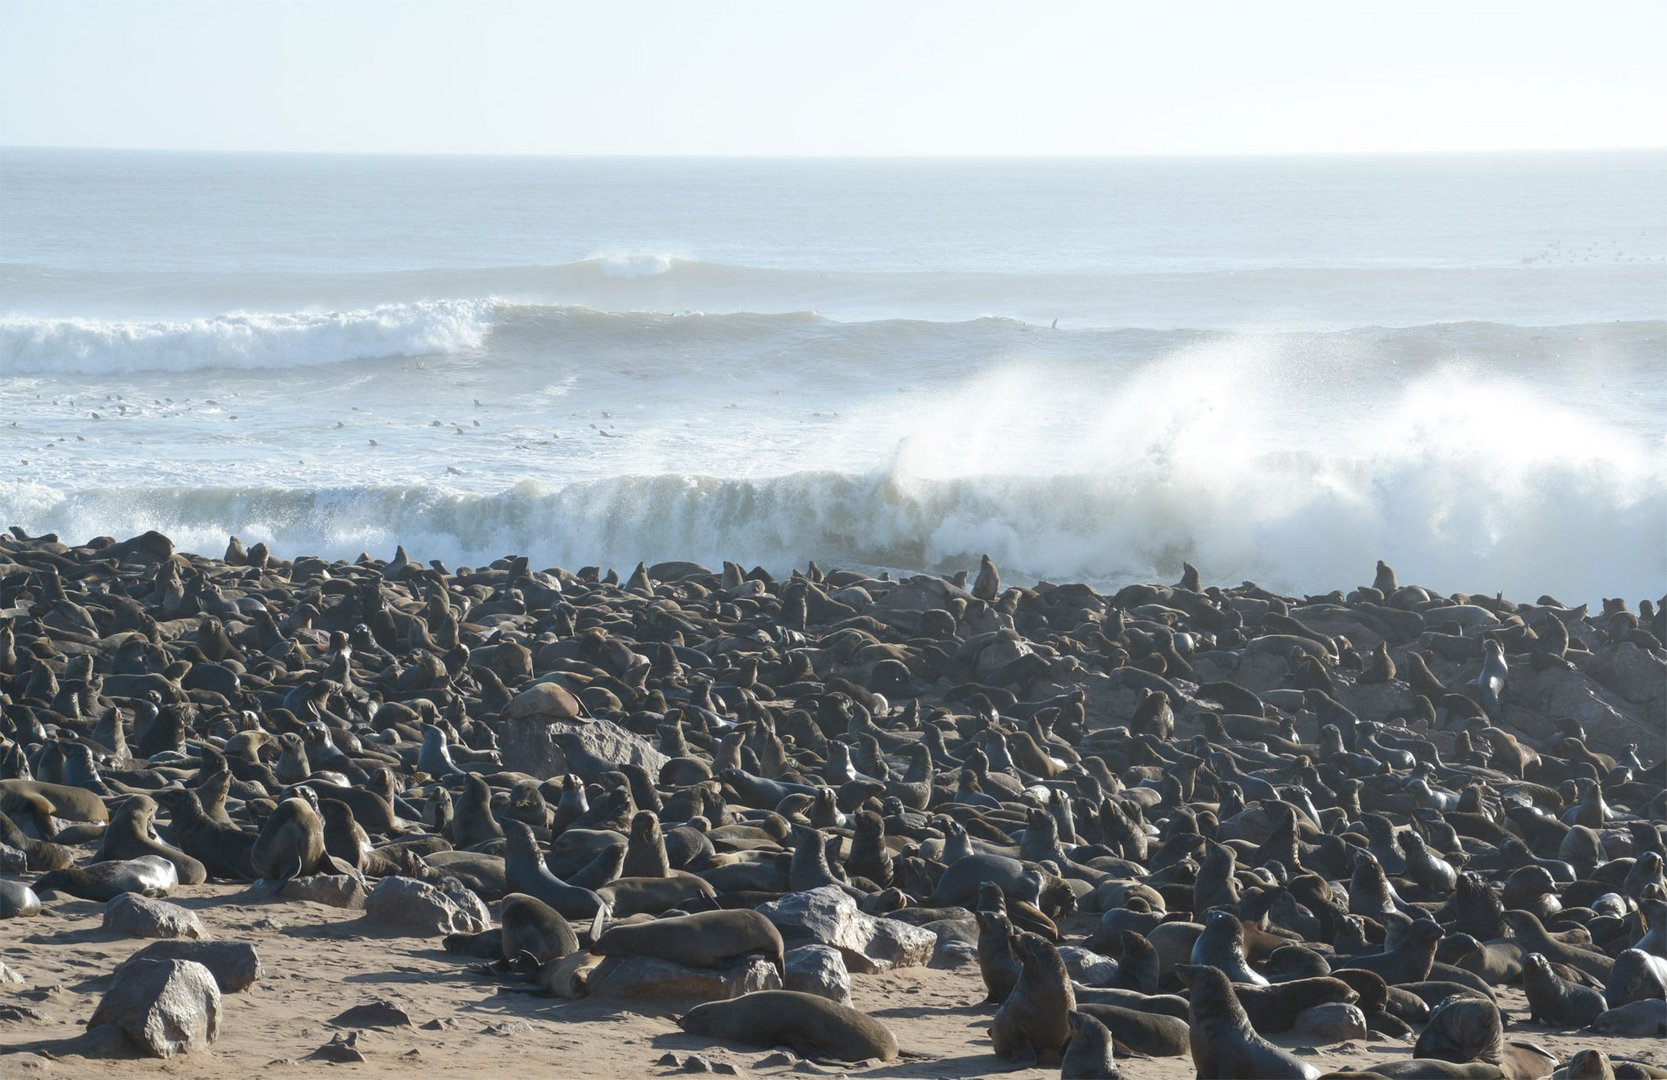 Robbenkolonie a, Cape Cross